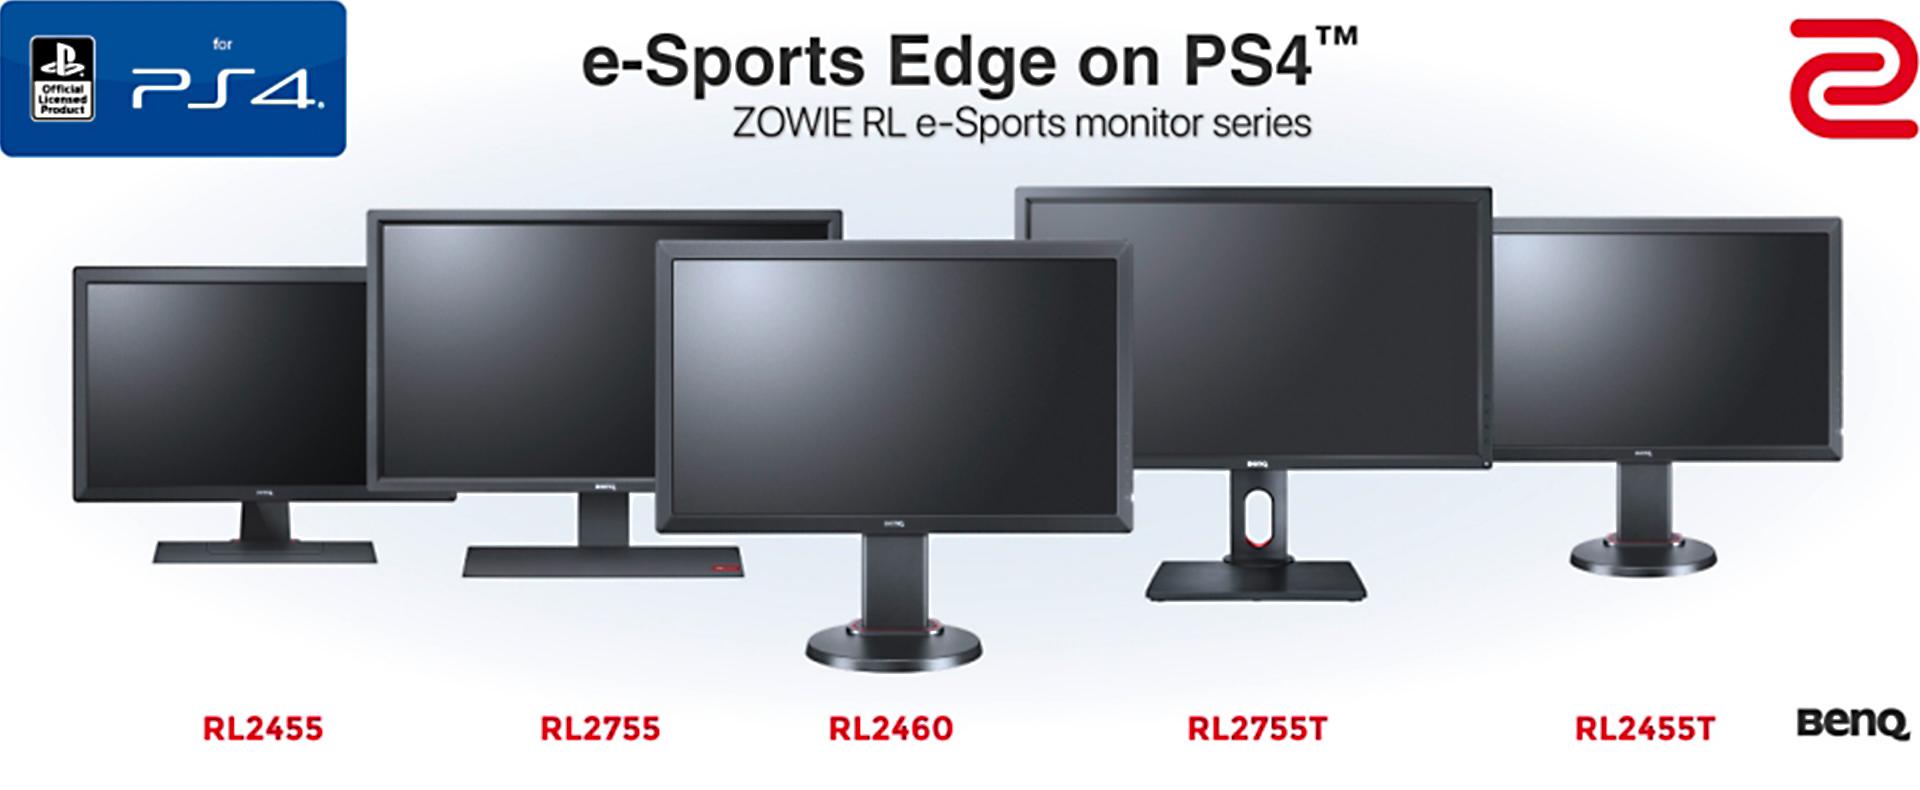 Zowie/Benq - RL e-Sports monitor series